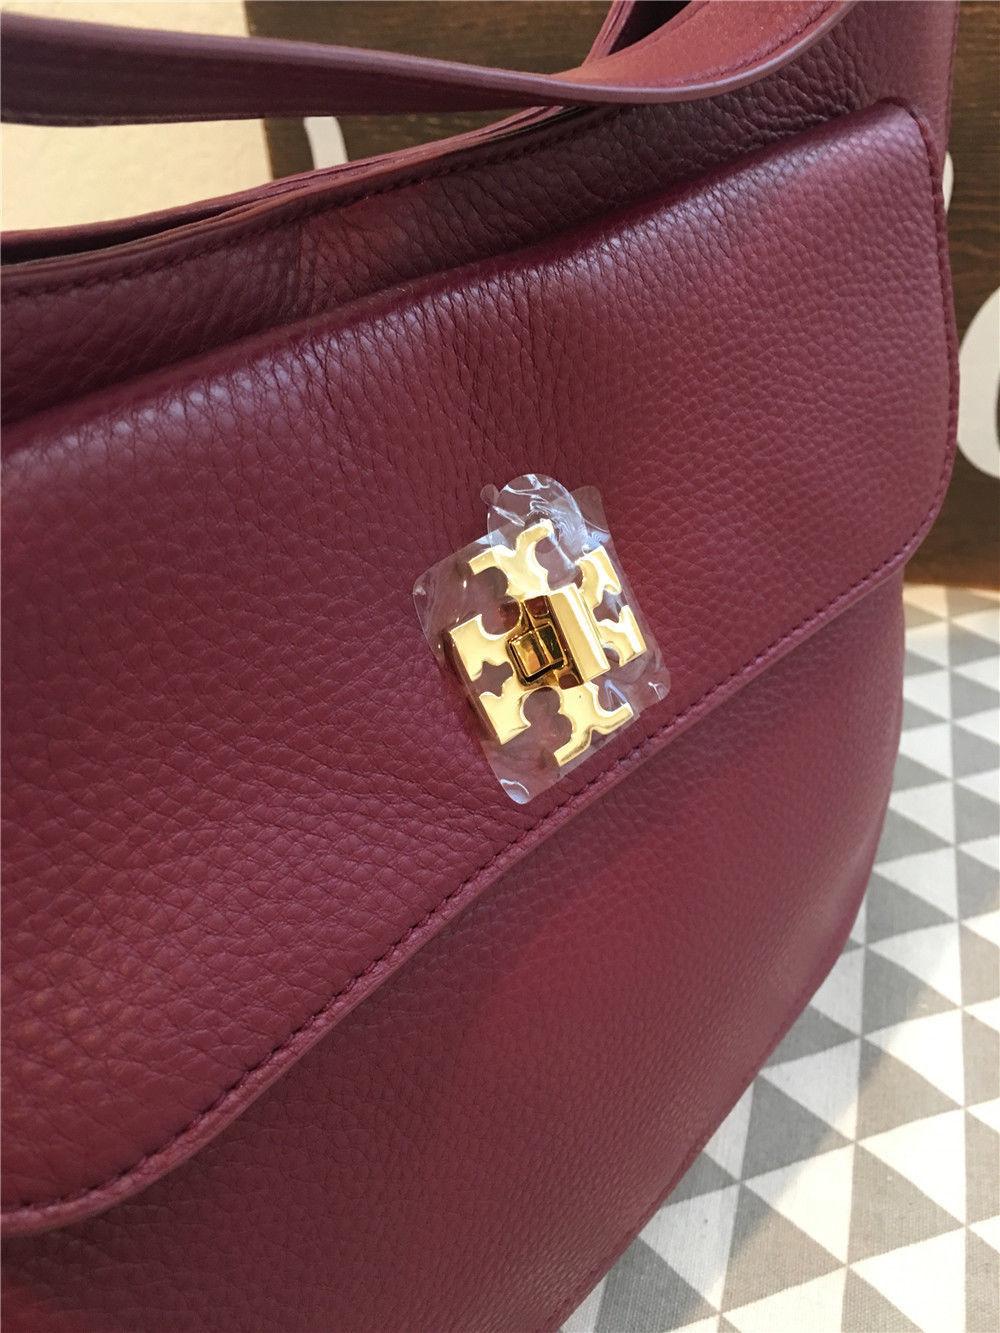 566ad27e8c38 Tory Burch Mercer Slouchy Hobo Shiraz Leather Handbag 31386-517